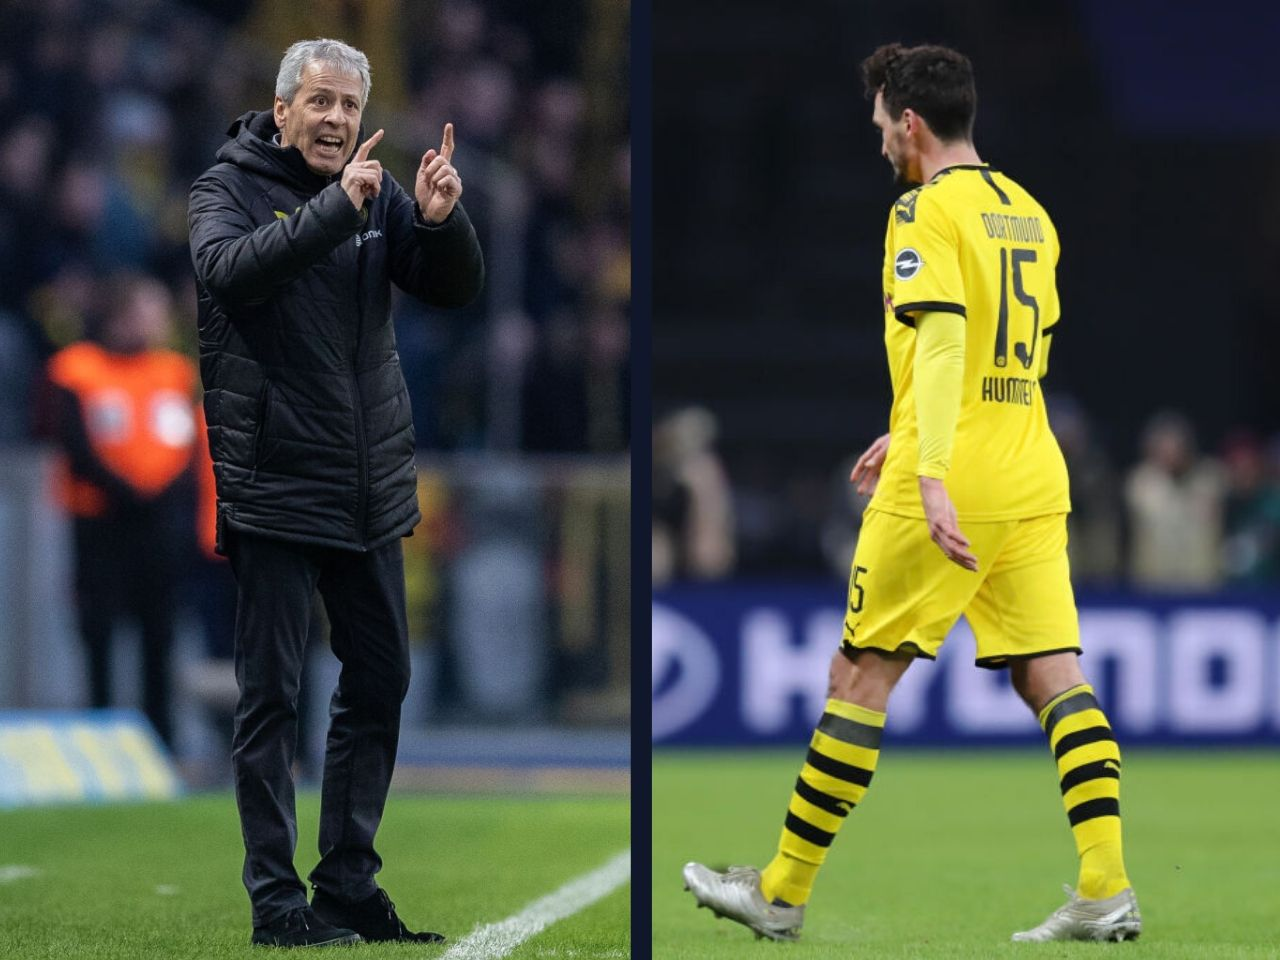 Lucien Favre, Mats Hummels, Borussia Dortmund, Bundesliga